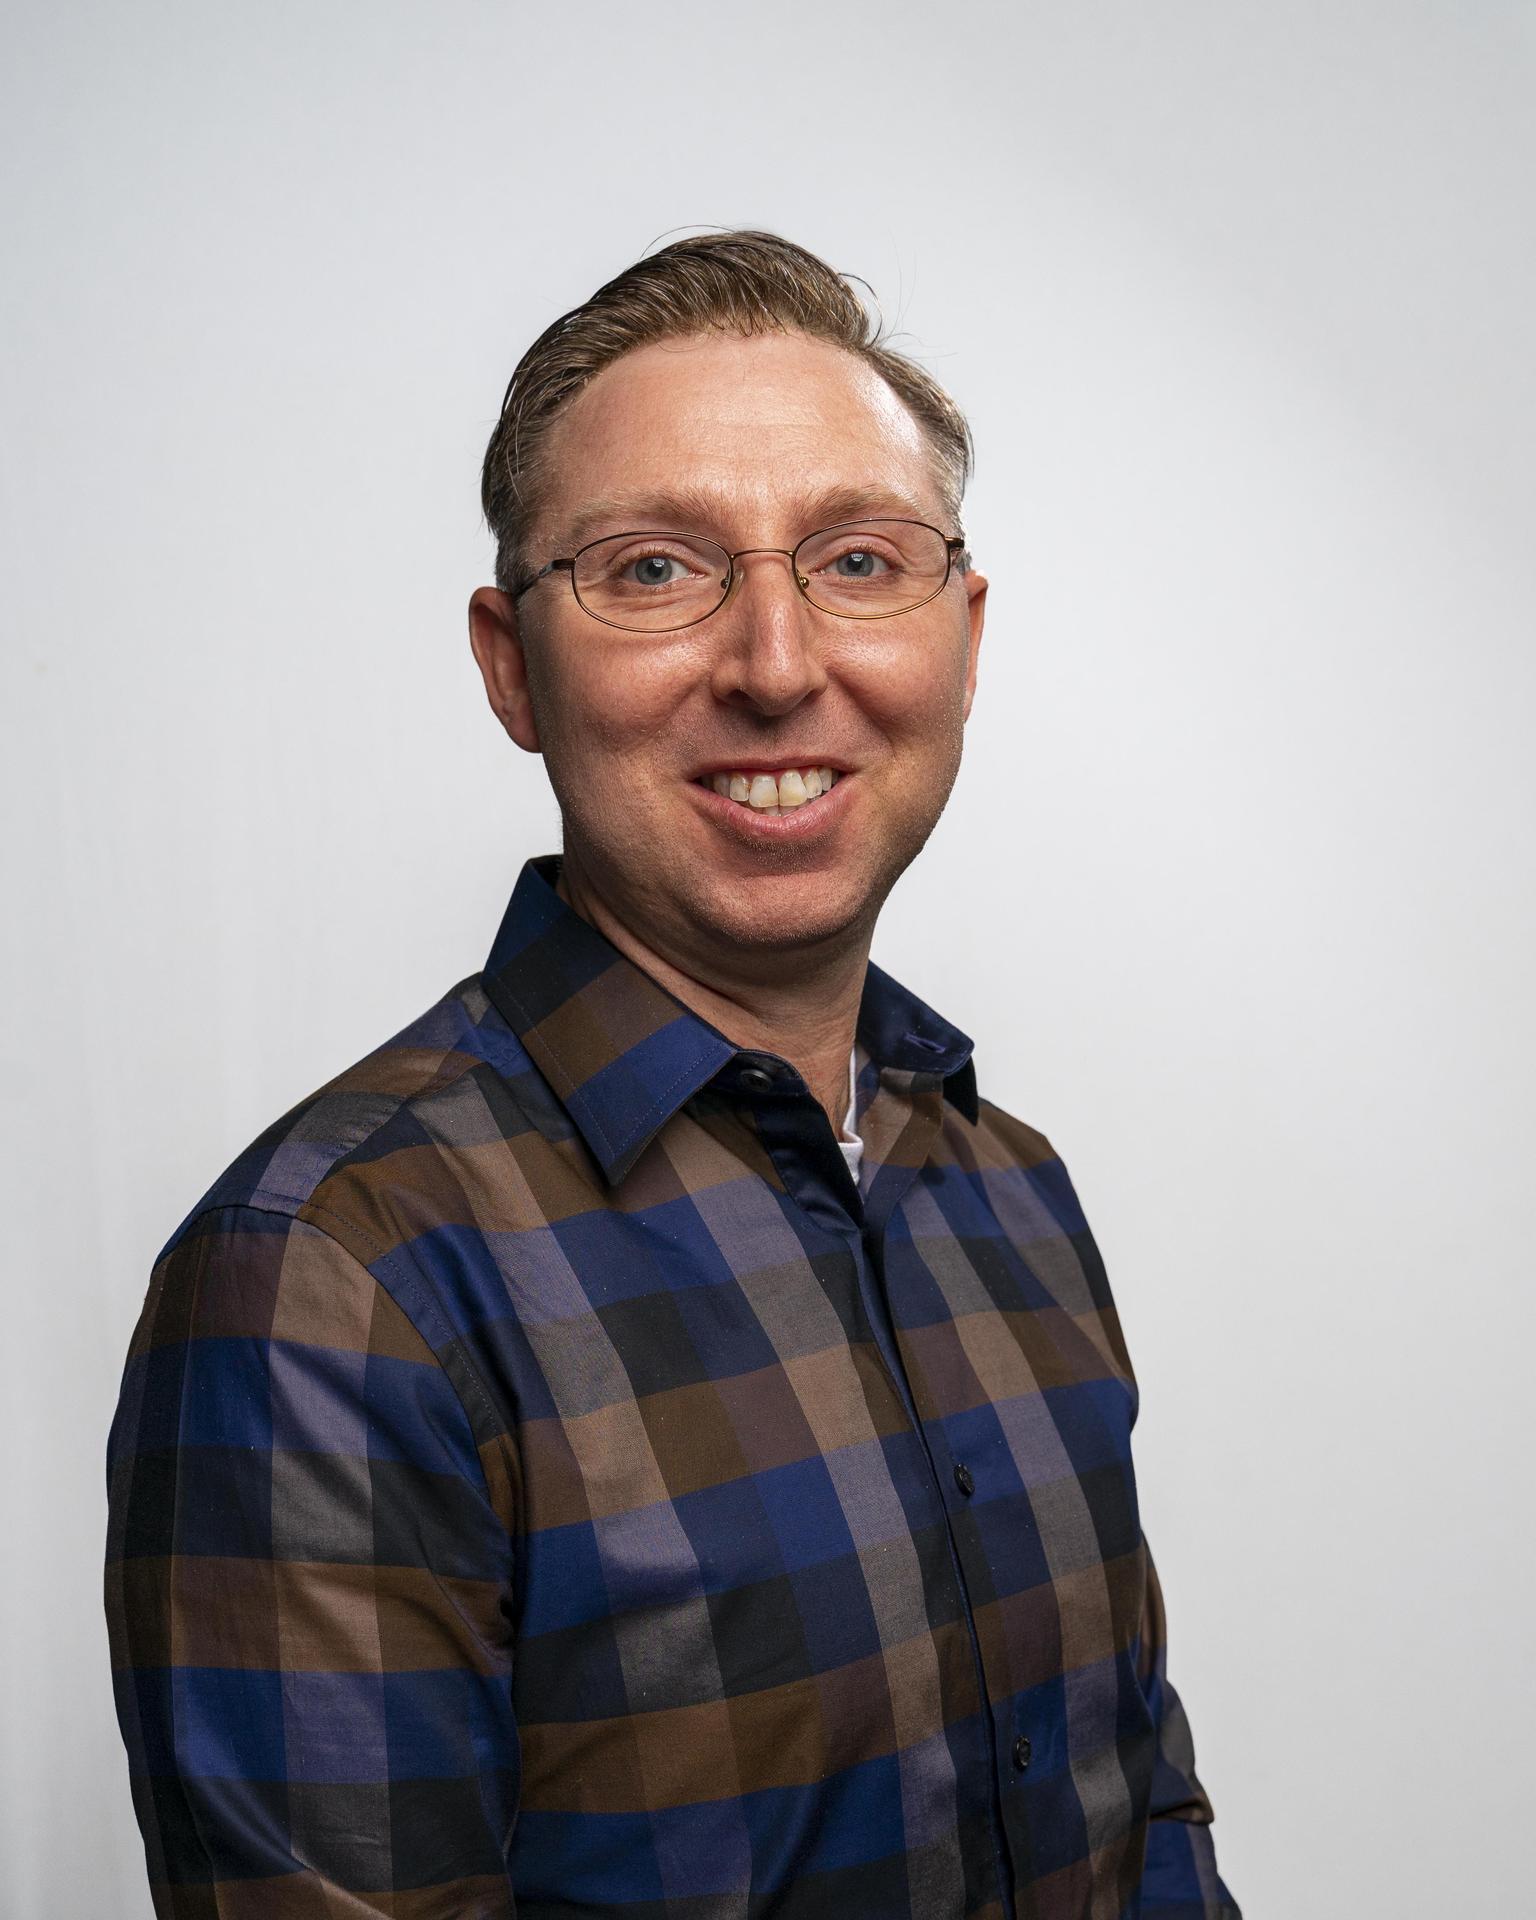 Sherman Knetig, Theater Arts Director